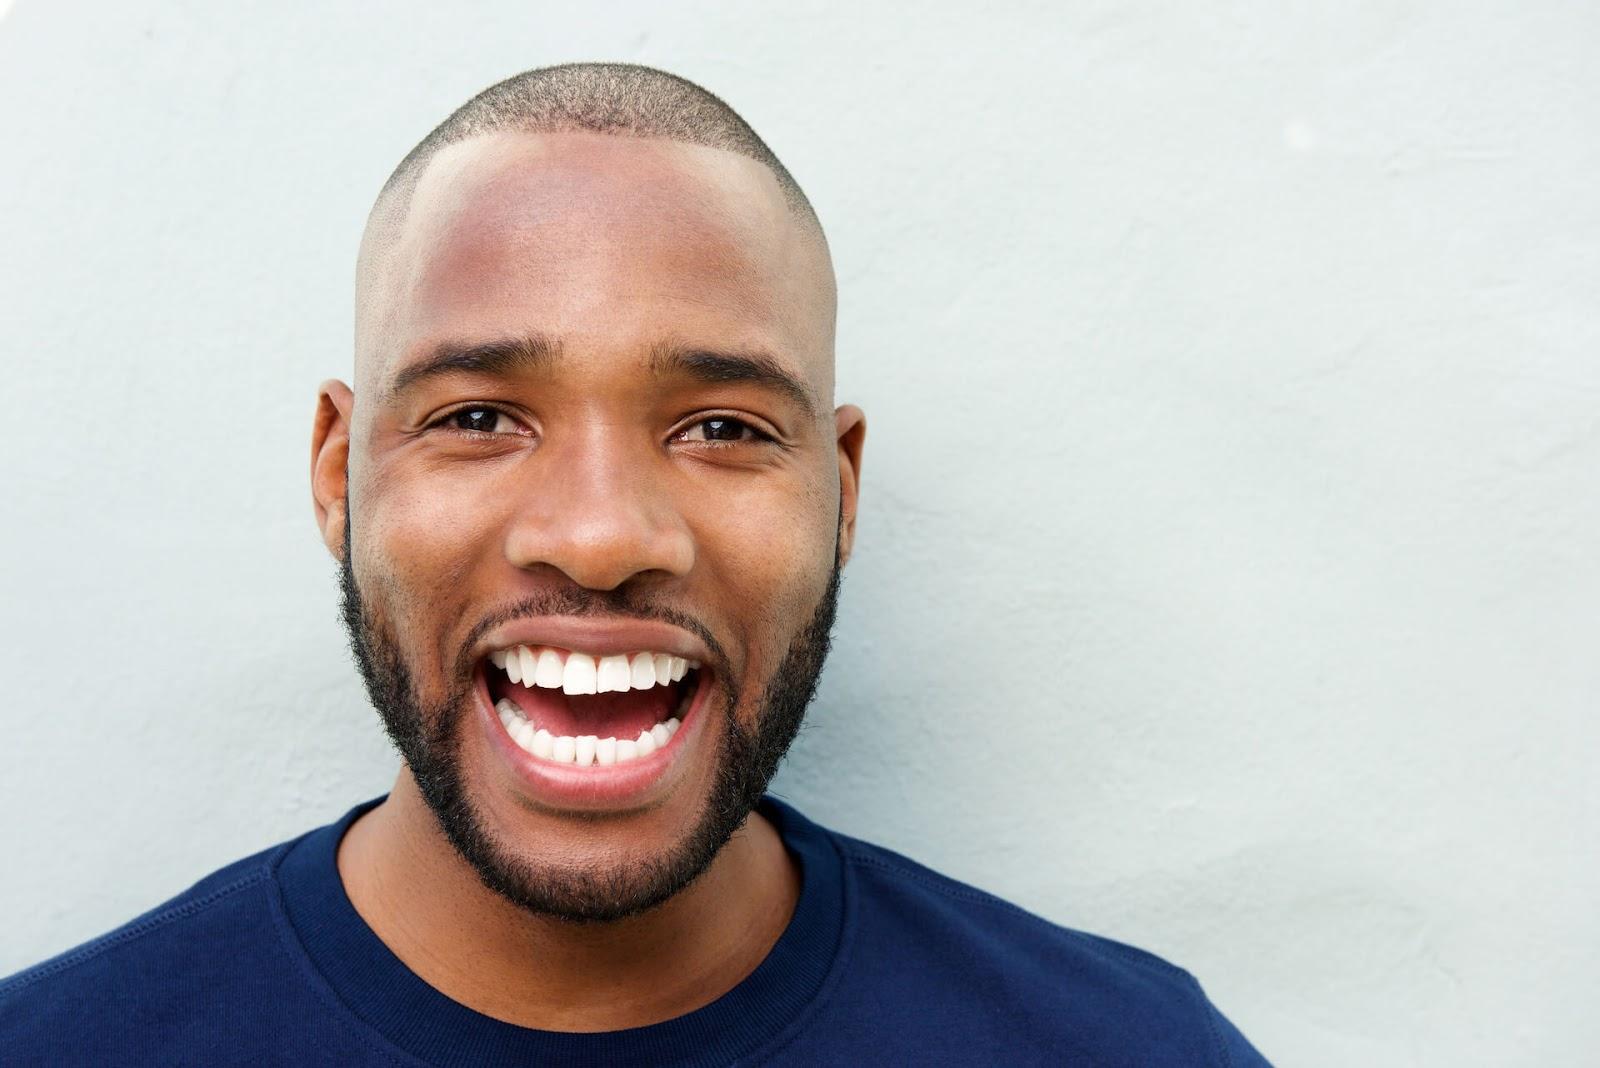 Man rocking a pearly-white smile